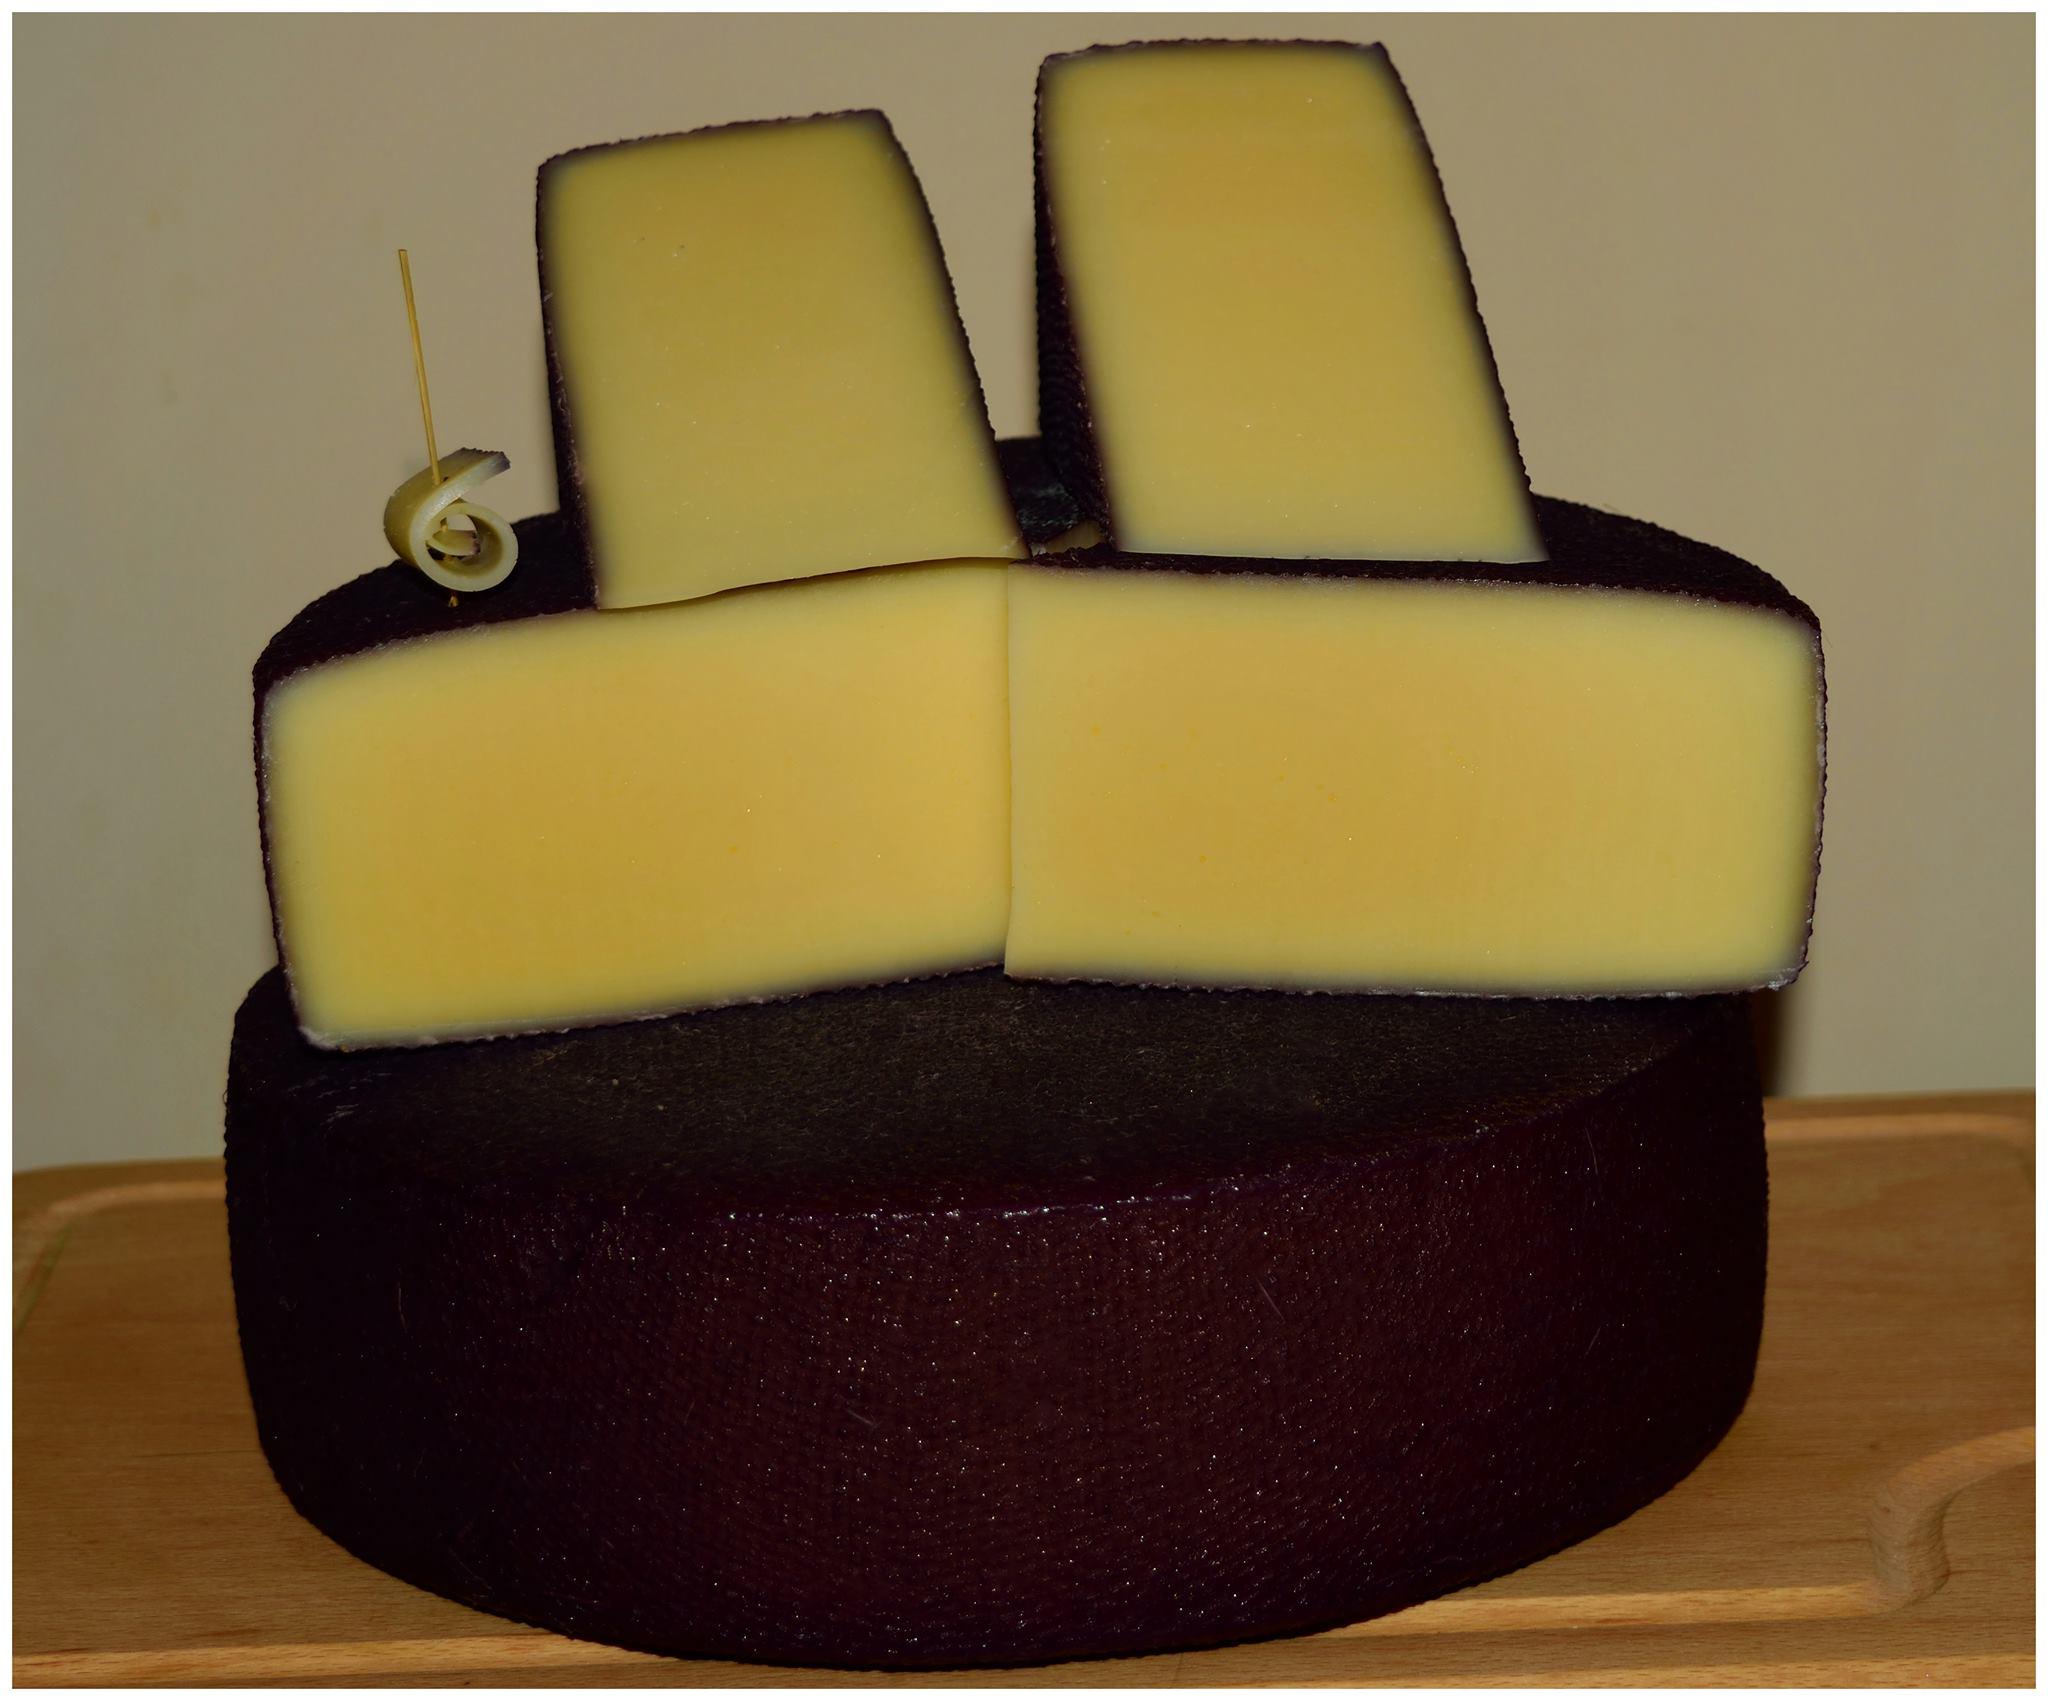 vörösborban érlelt sajt